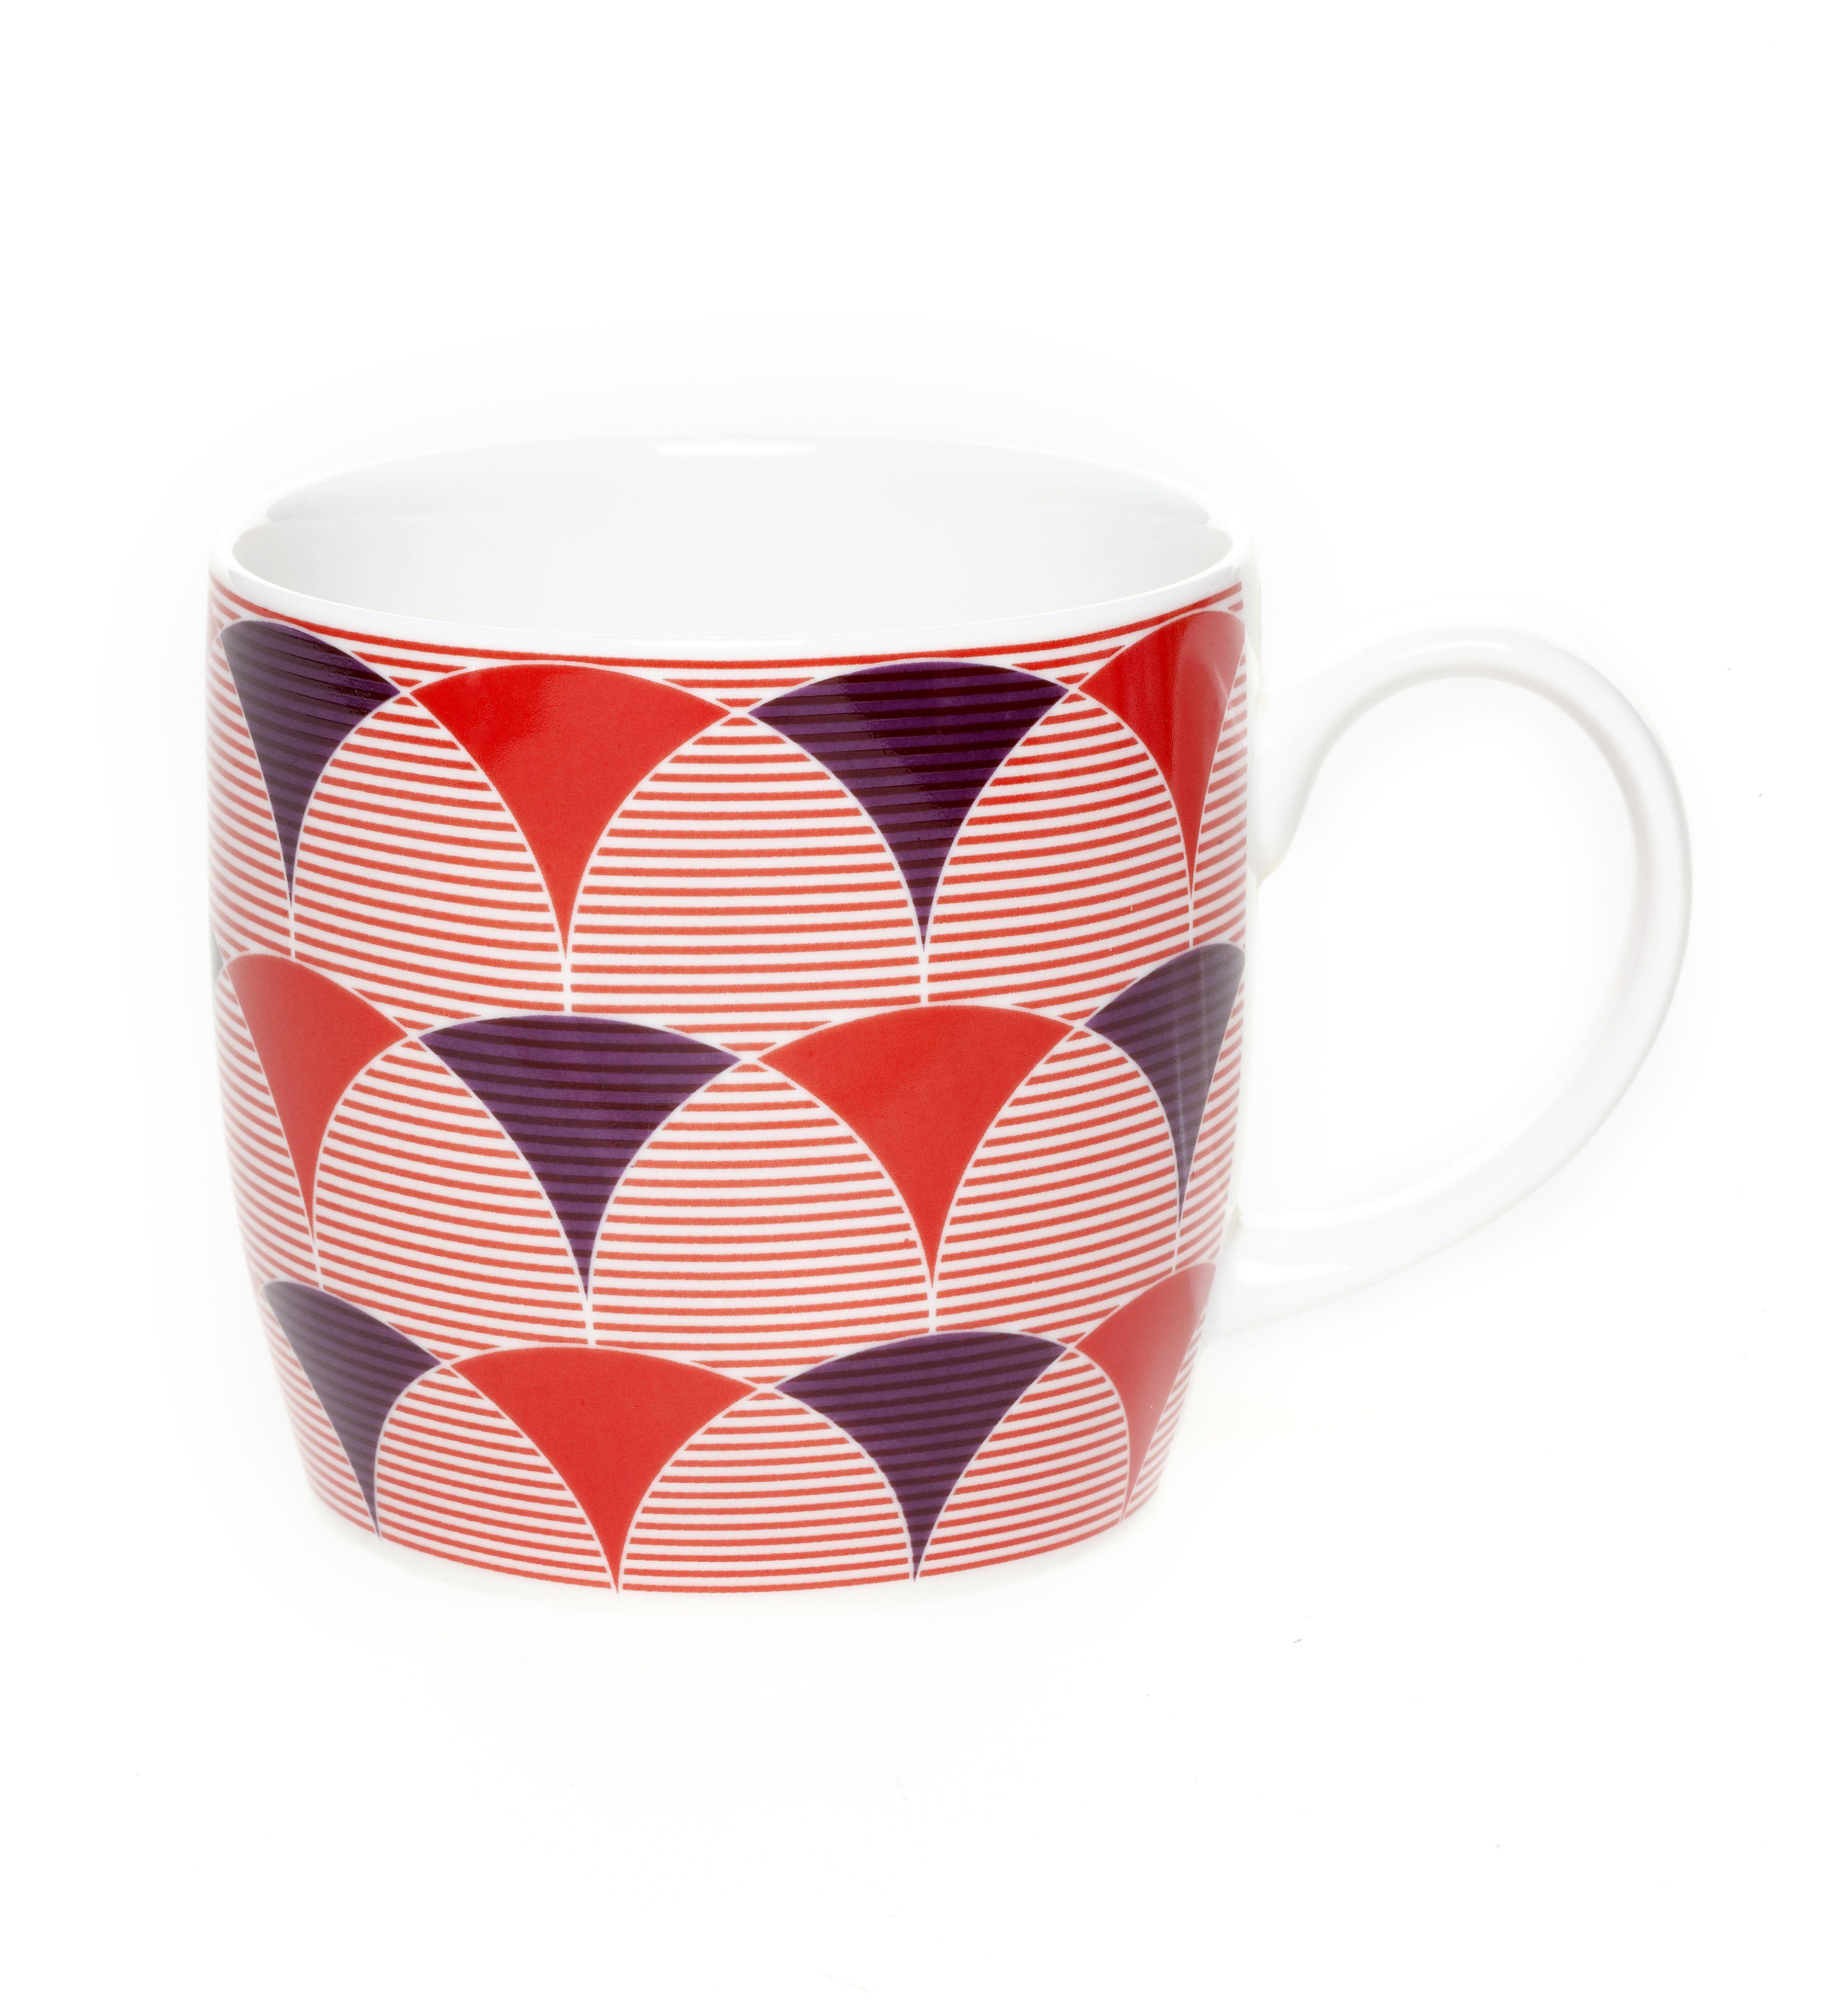 a.Deco Mug 330ml - Set of 6-CMG004